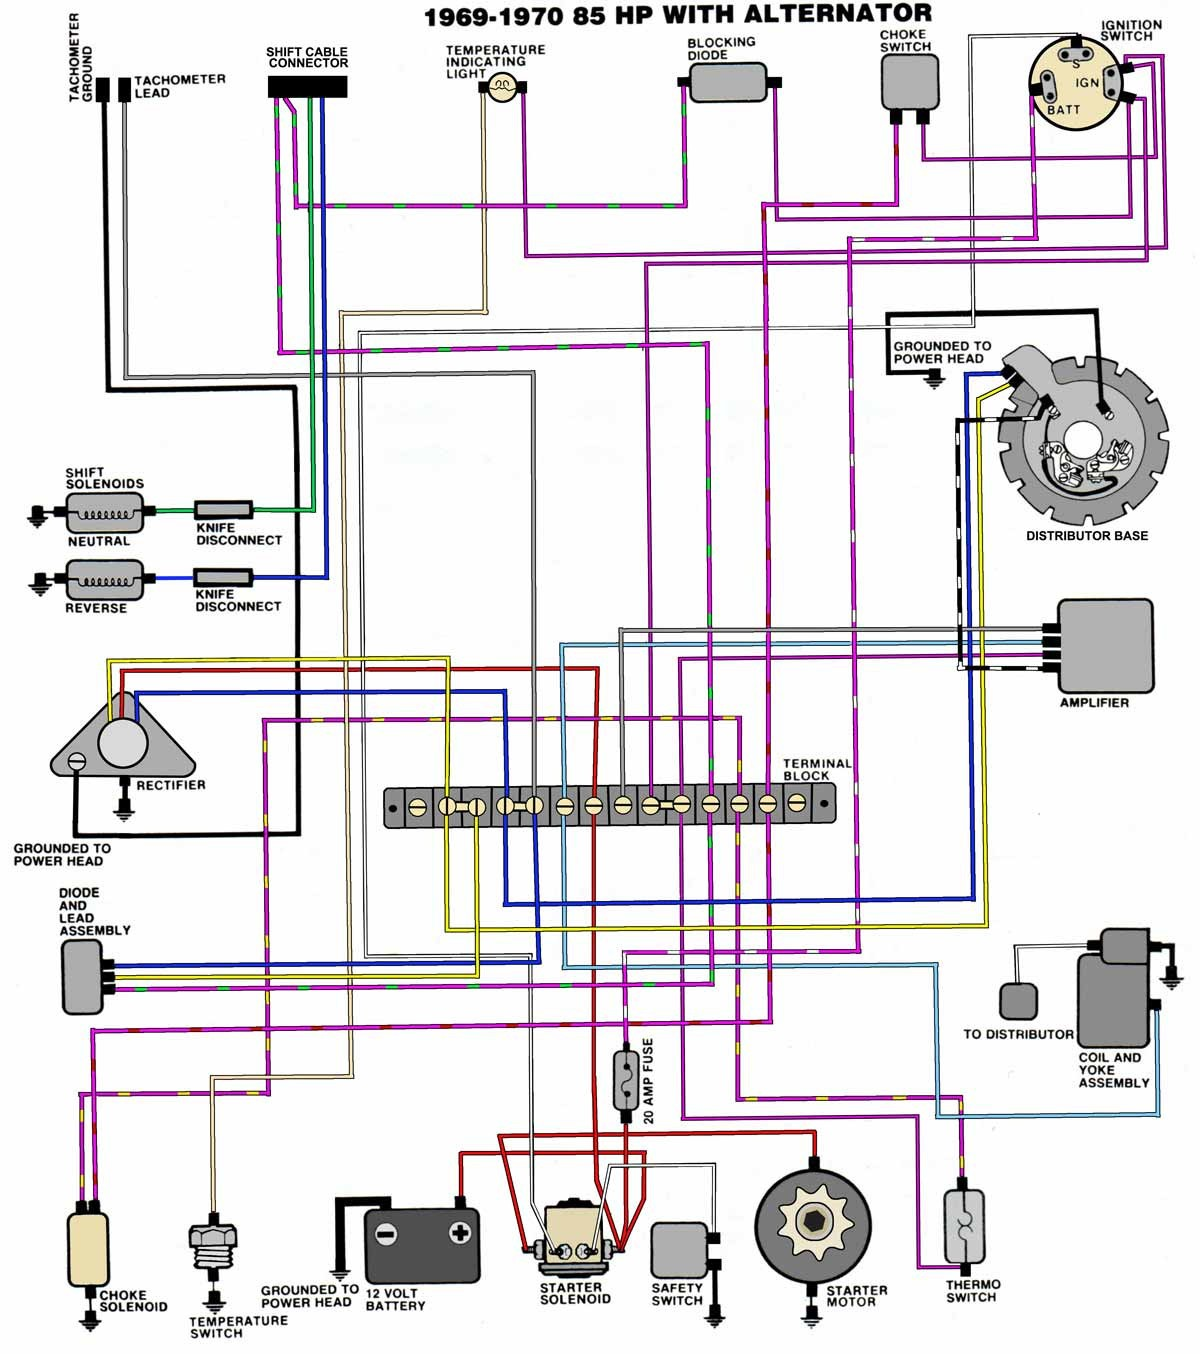 1977 85hp Johnson Wiring Diagram - Wiring Diagram Post